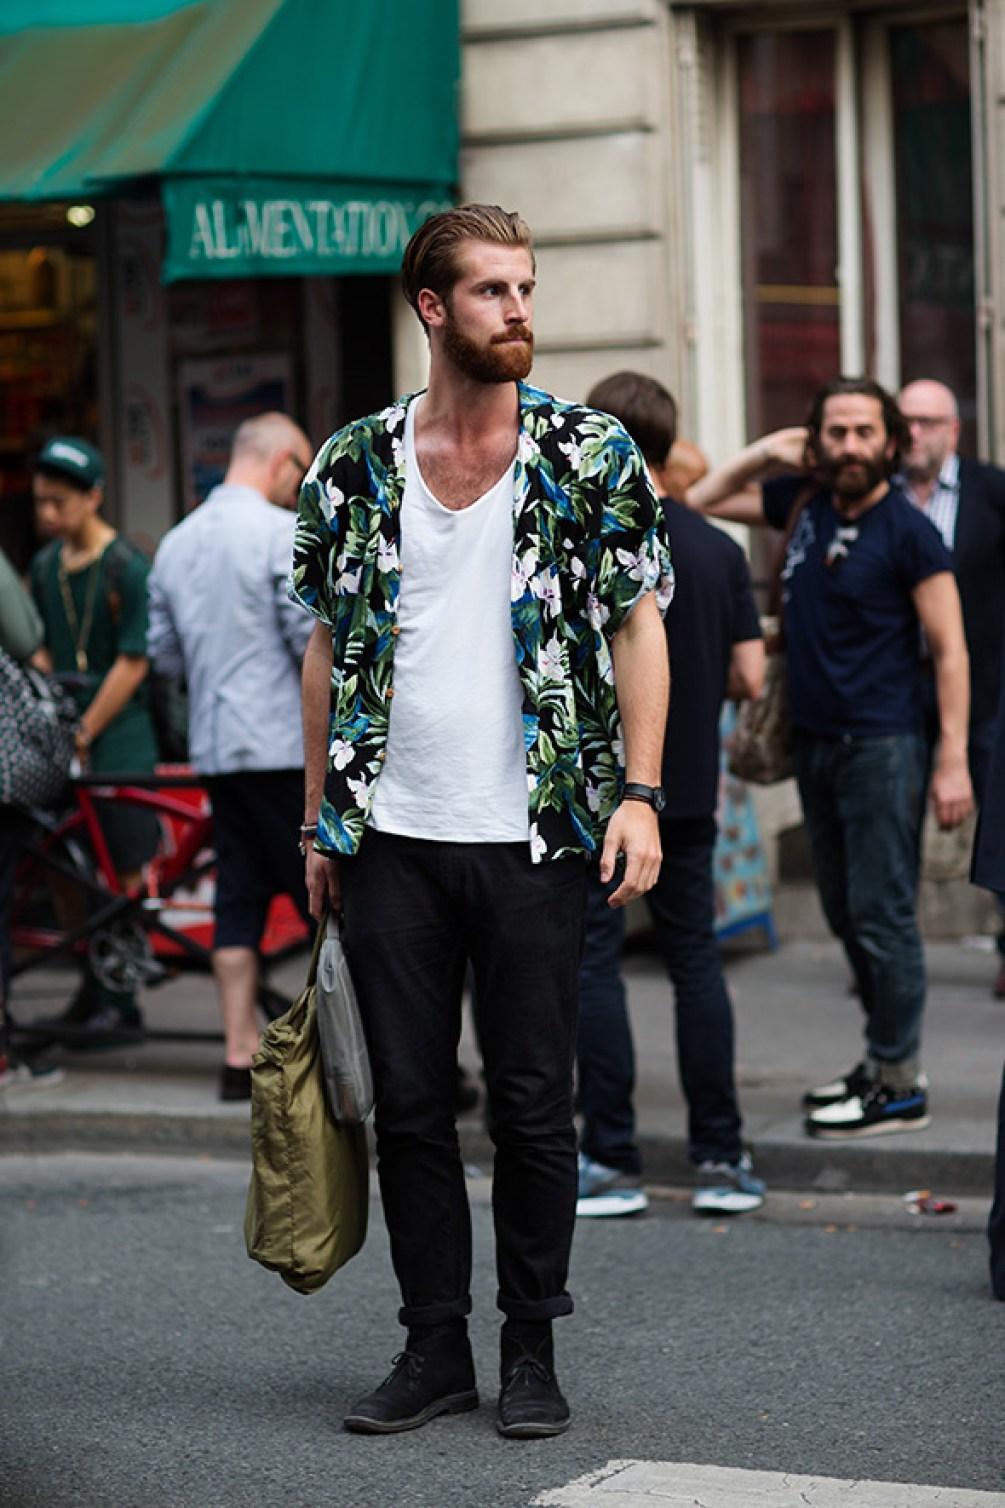 tropical print shirts are 2018 summer fashion essentials for men!